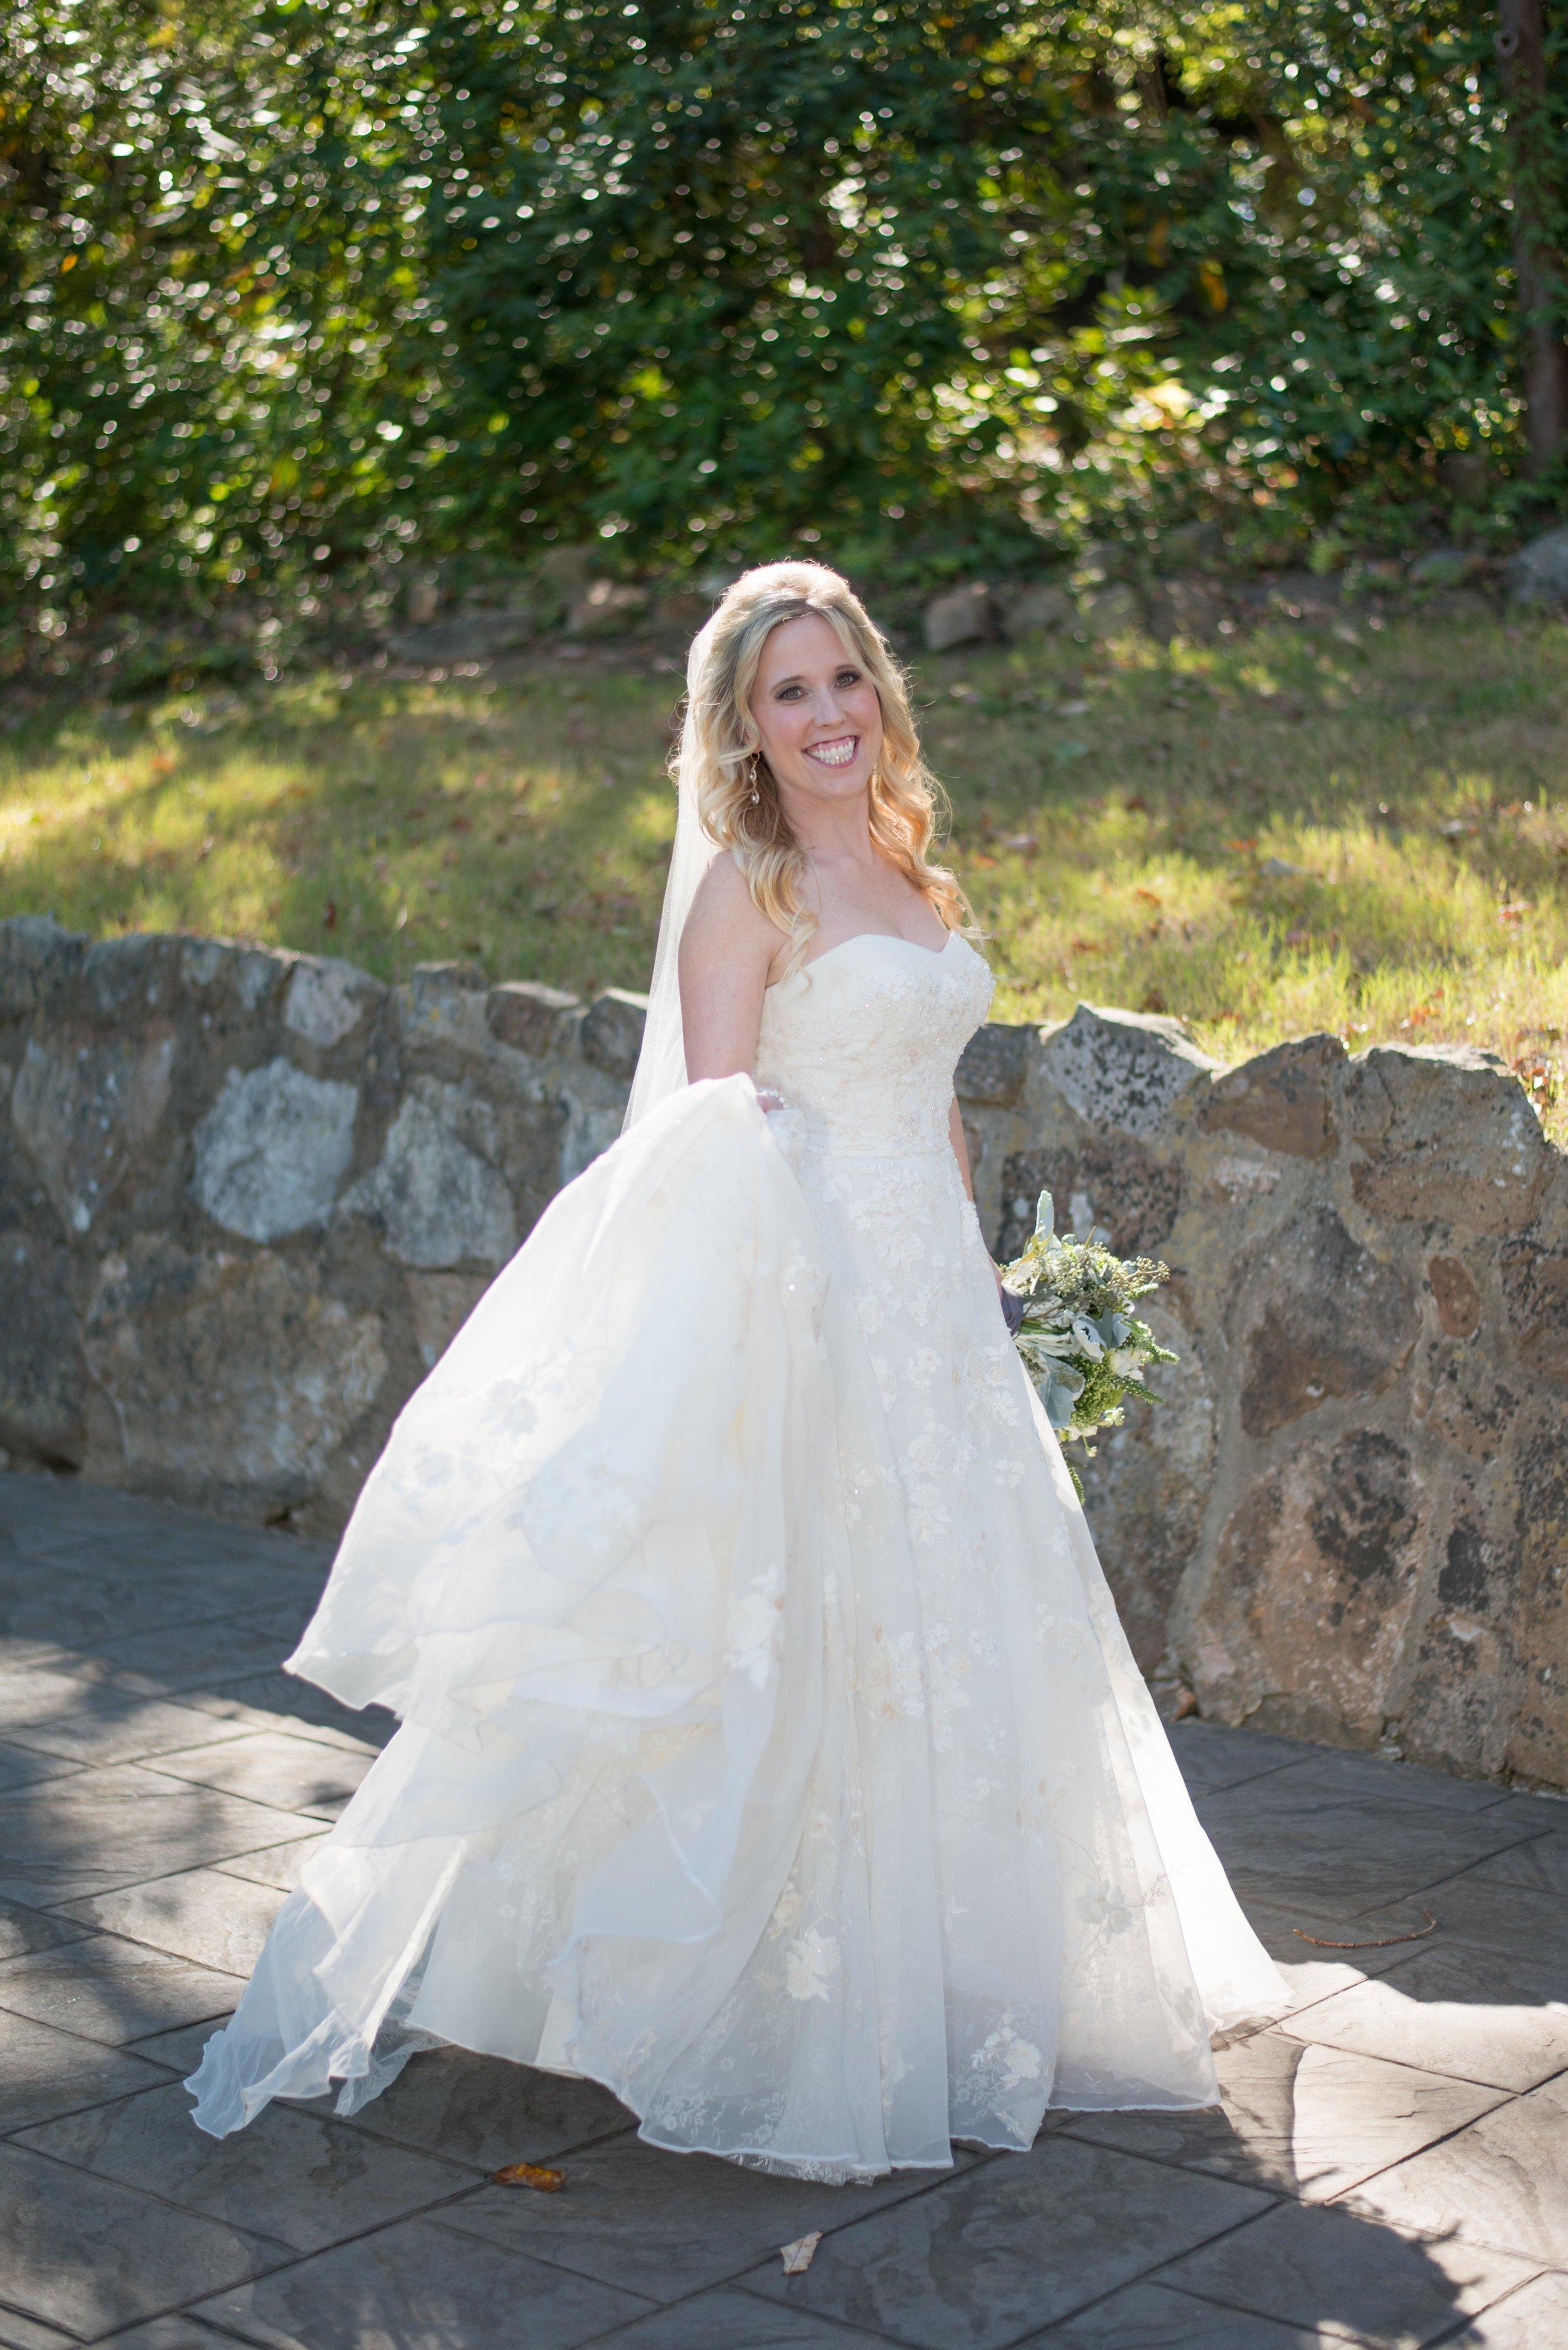 00001_Kuhnert-Wedding-22.jpg